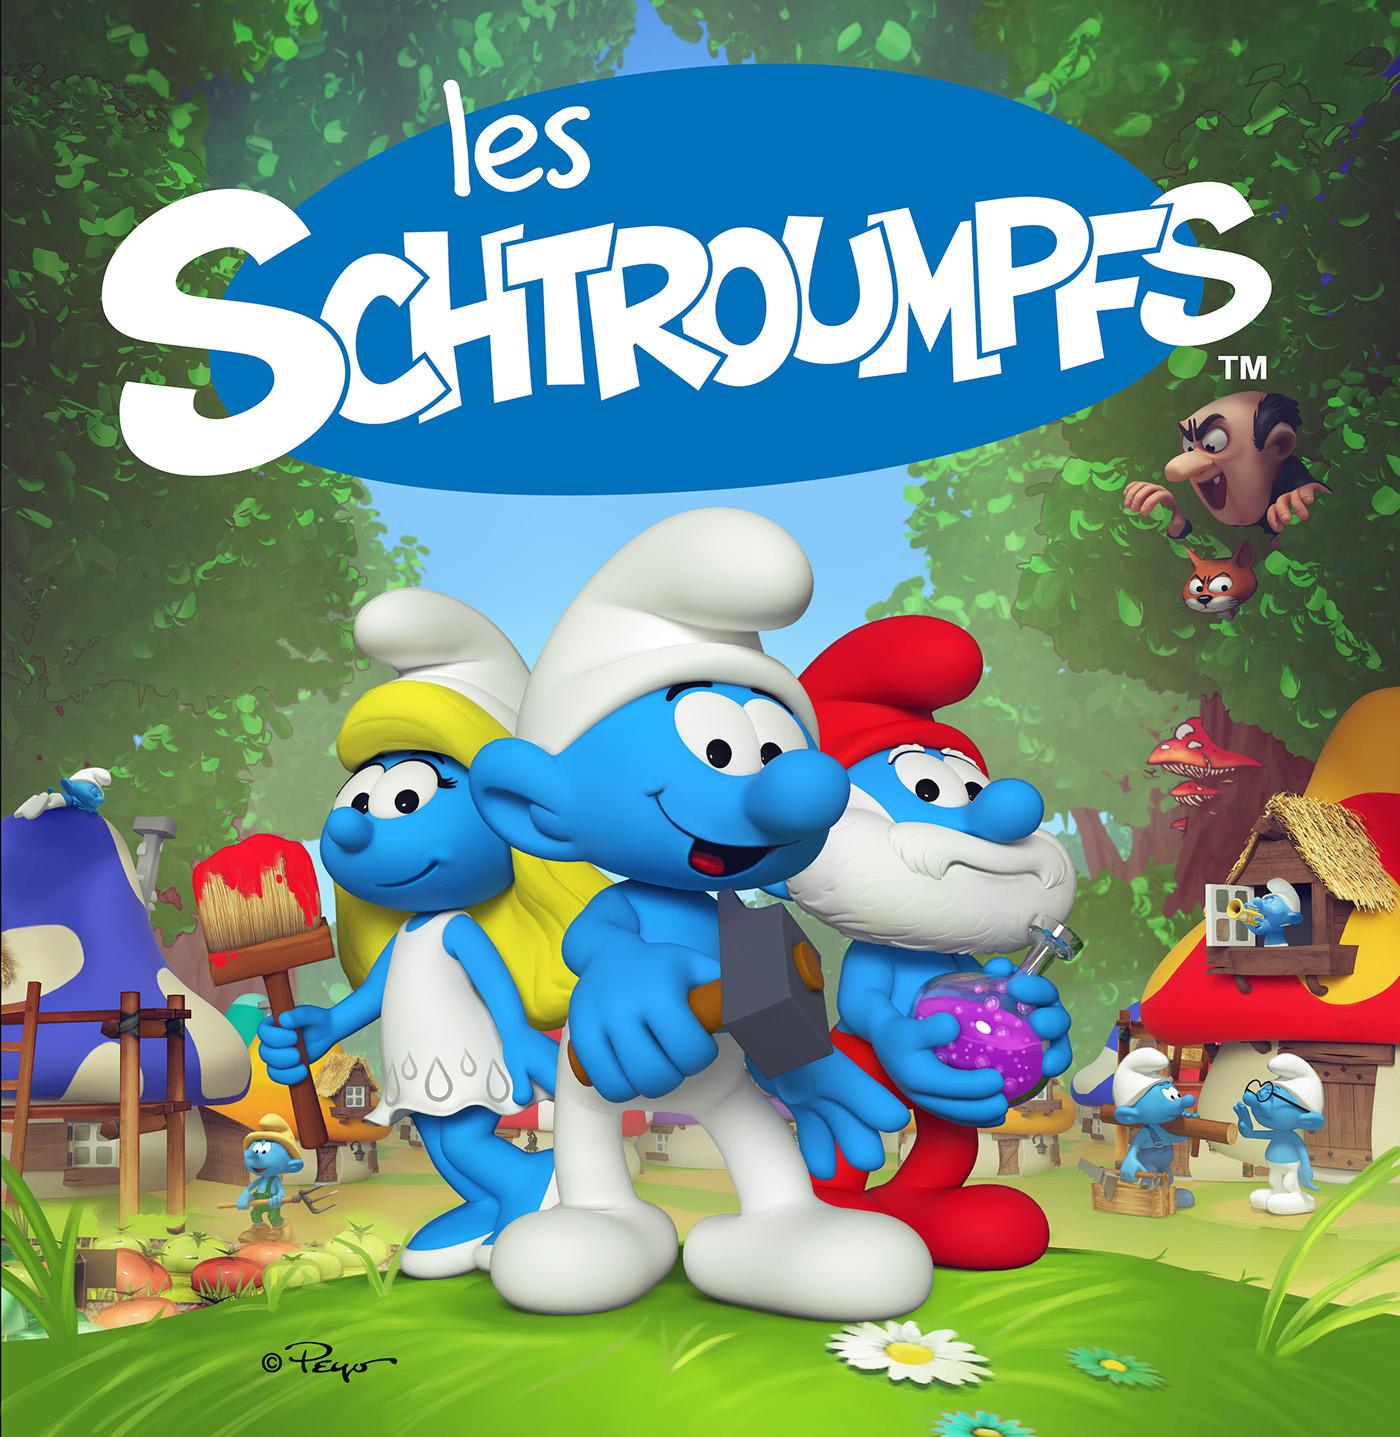 Schtroumpfs,smurfs,Peyo,game,Comic Book,bd,video game,cartoon,ubisoft,blue